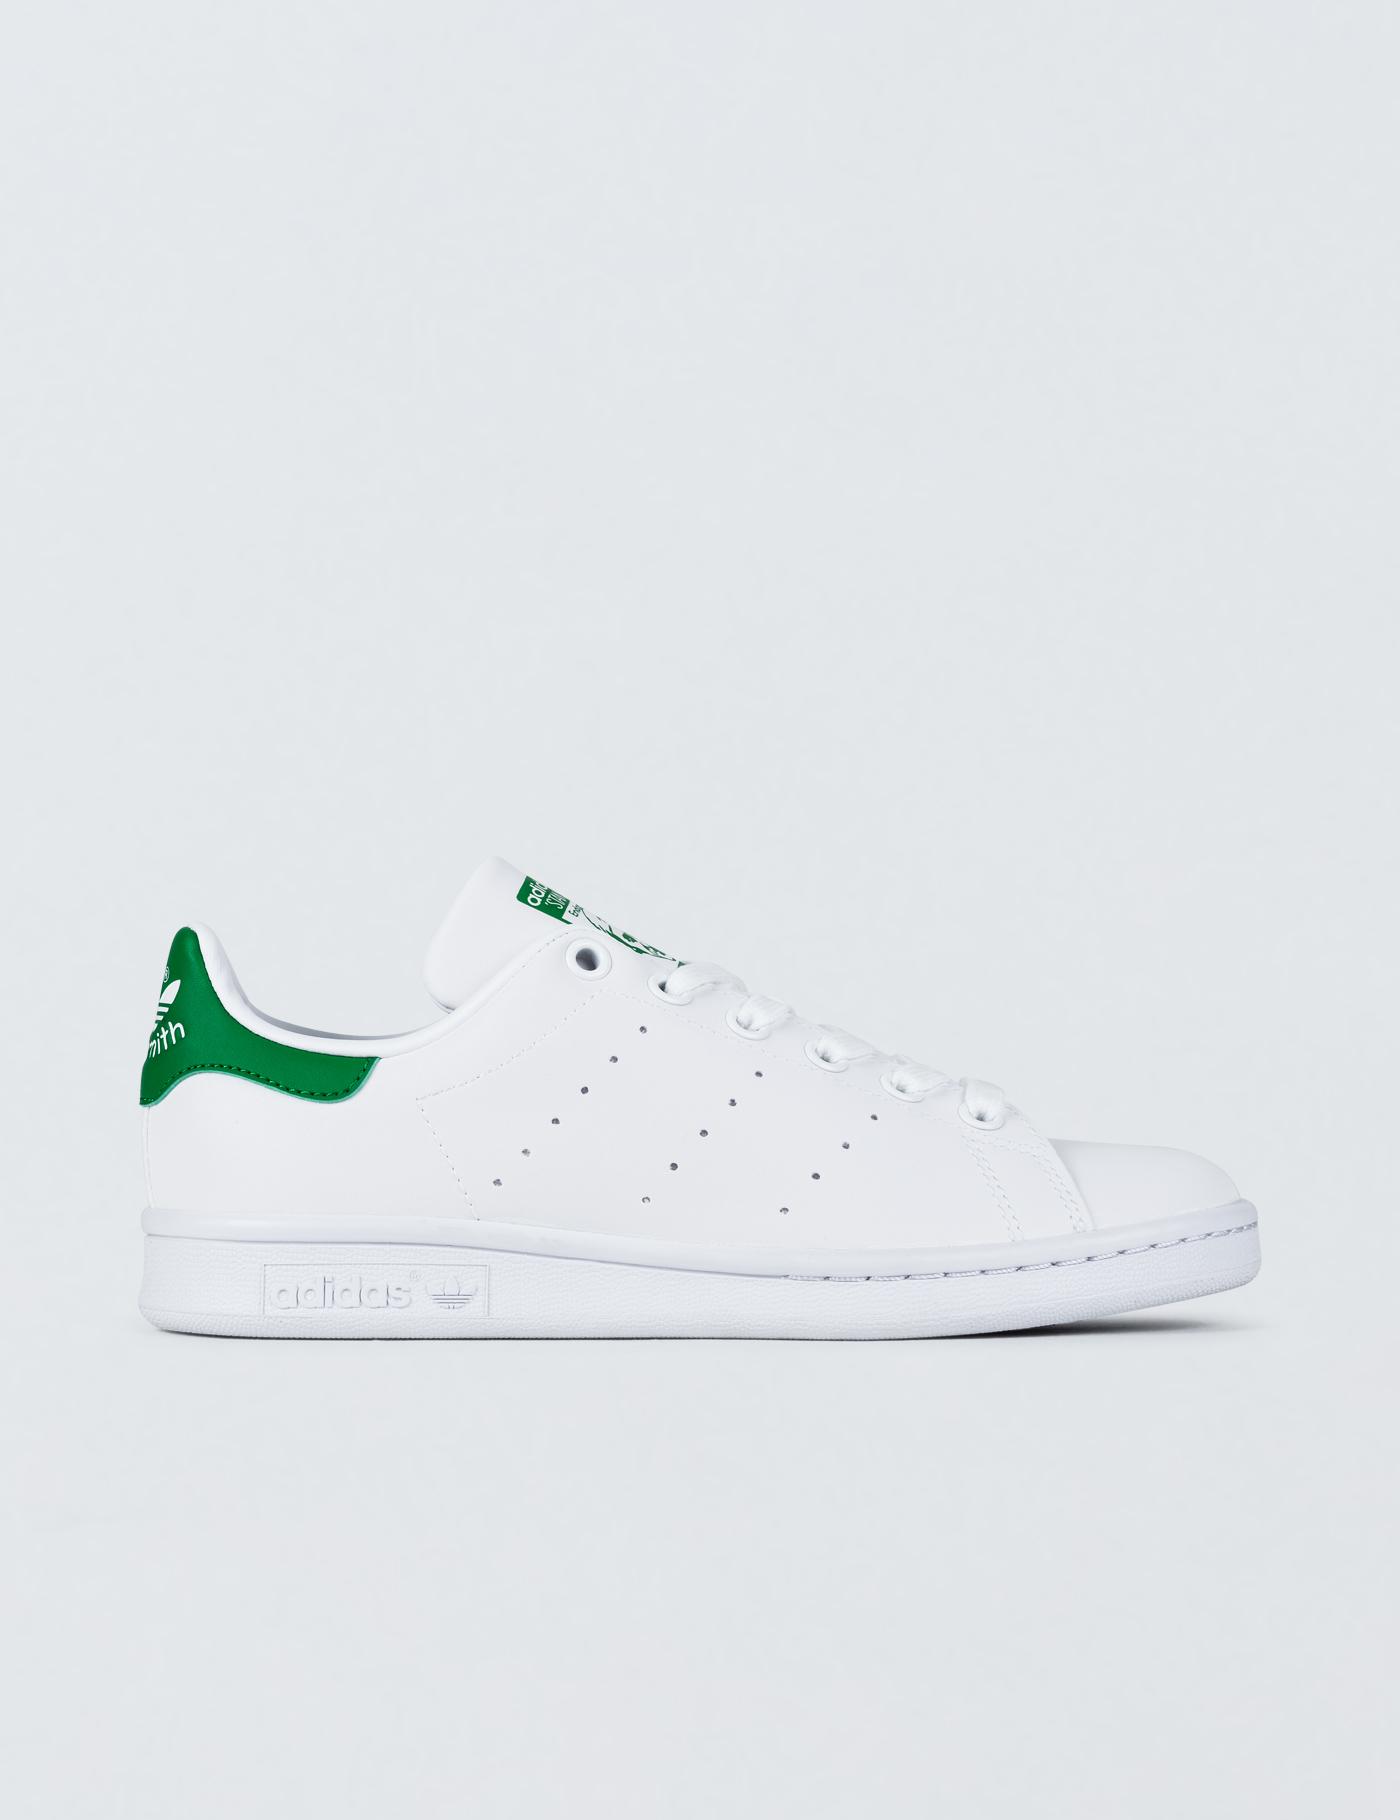 Adidas Originals Stan Smith W - Reflective Edition